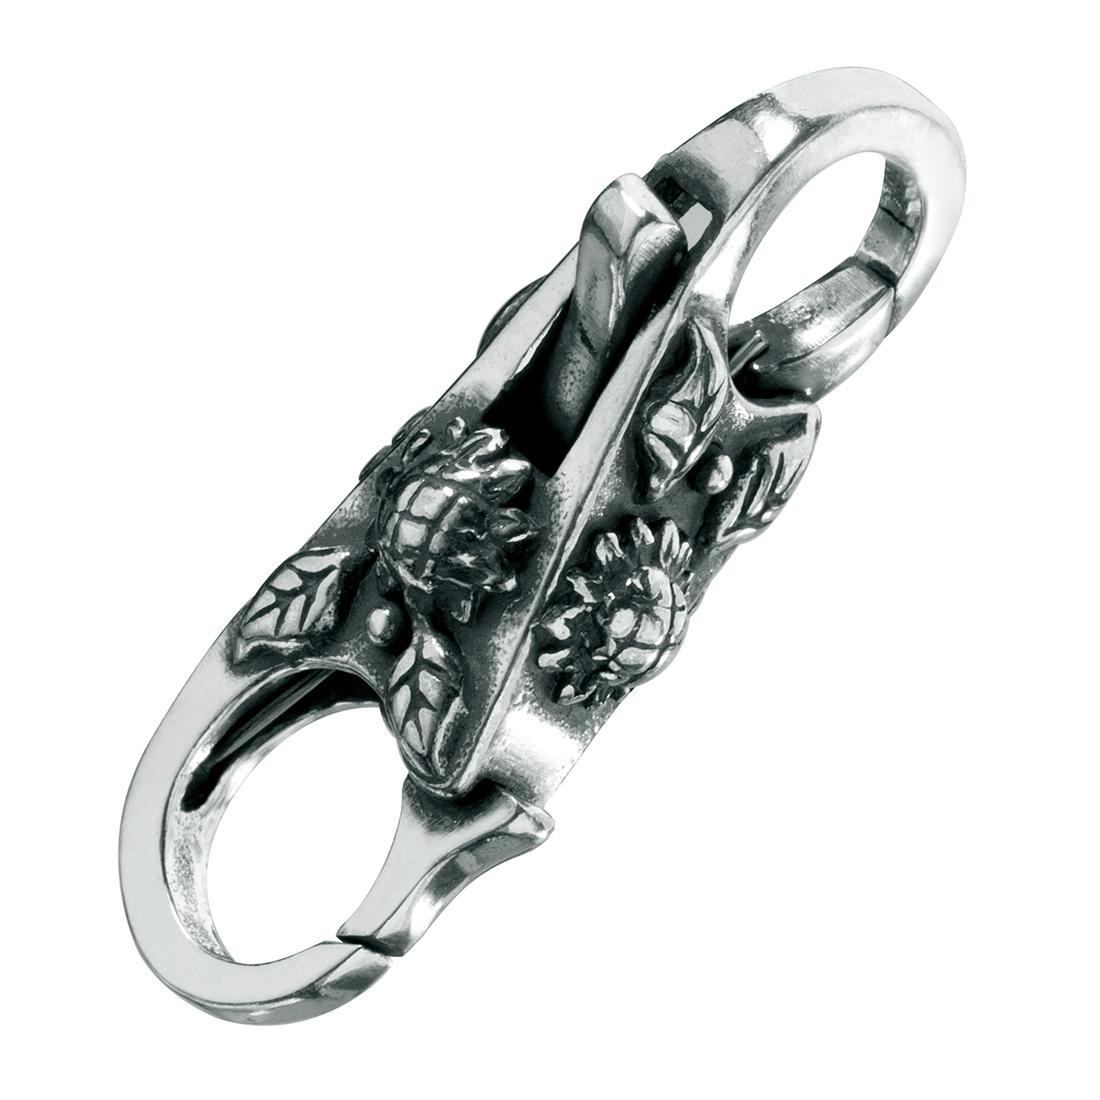 Karabinerverschluss Sonnenblume Schmuck für Beads Armband 925 Silber